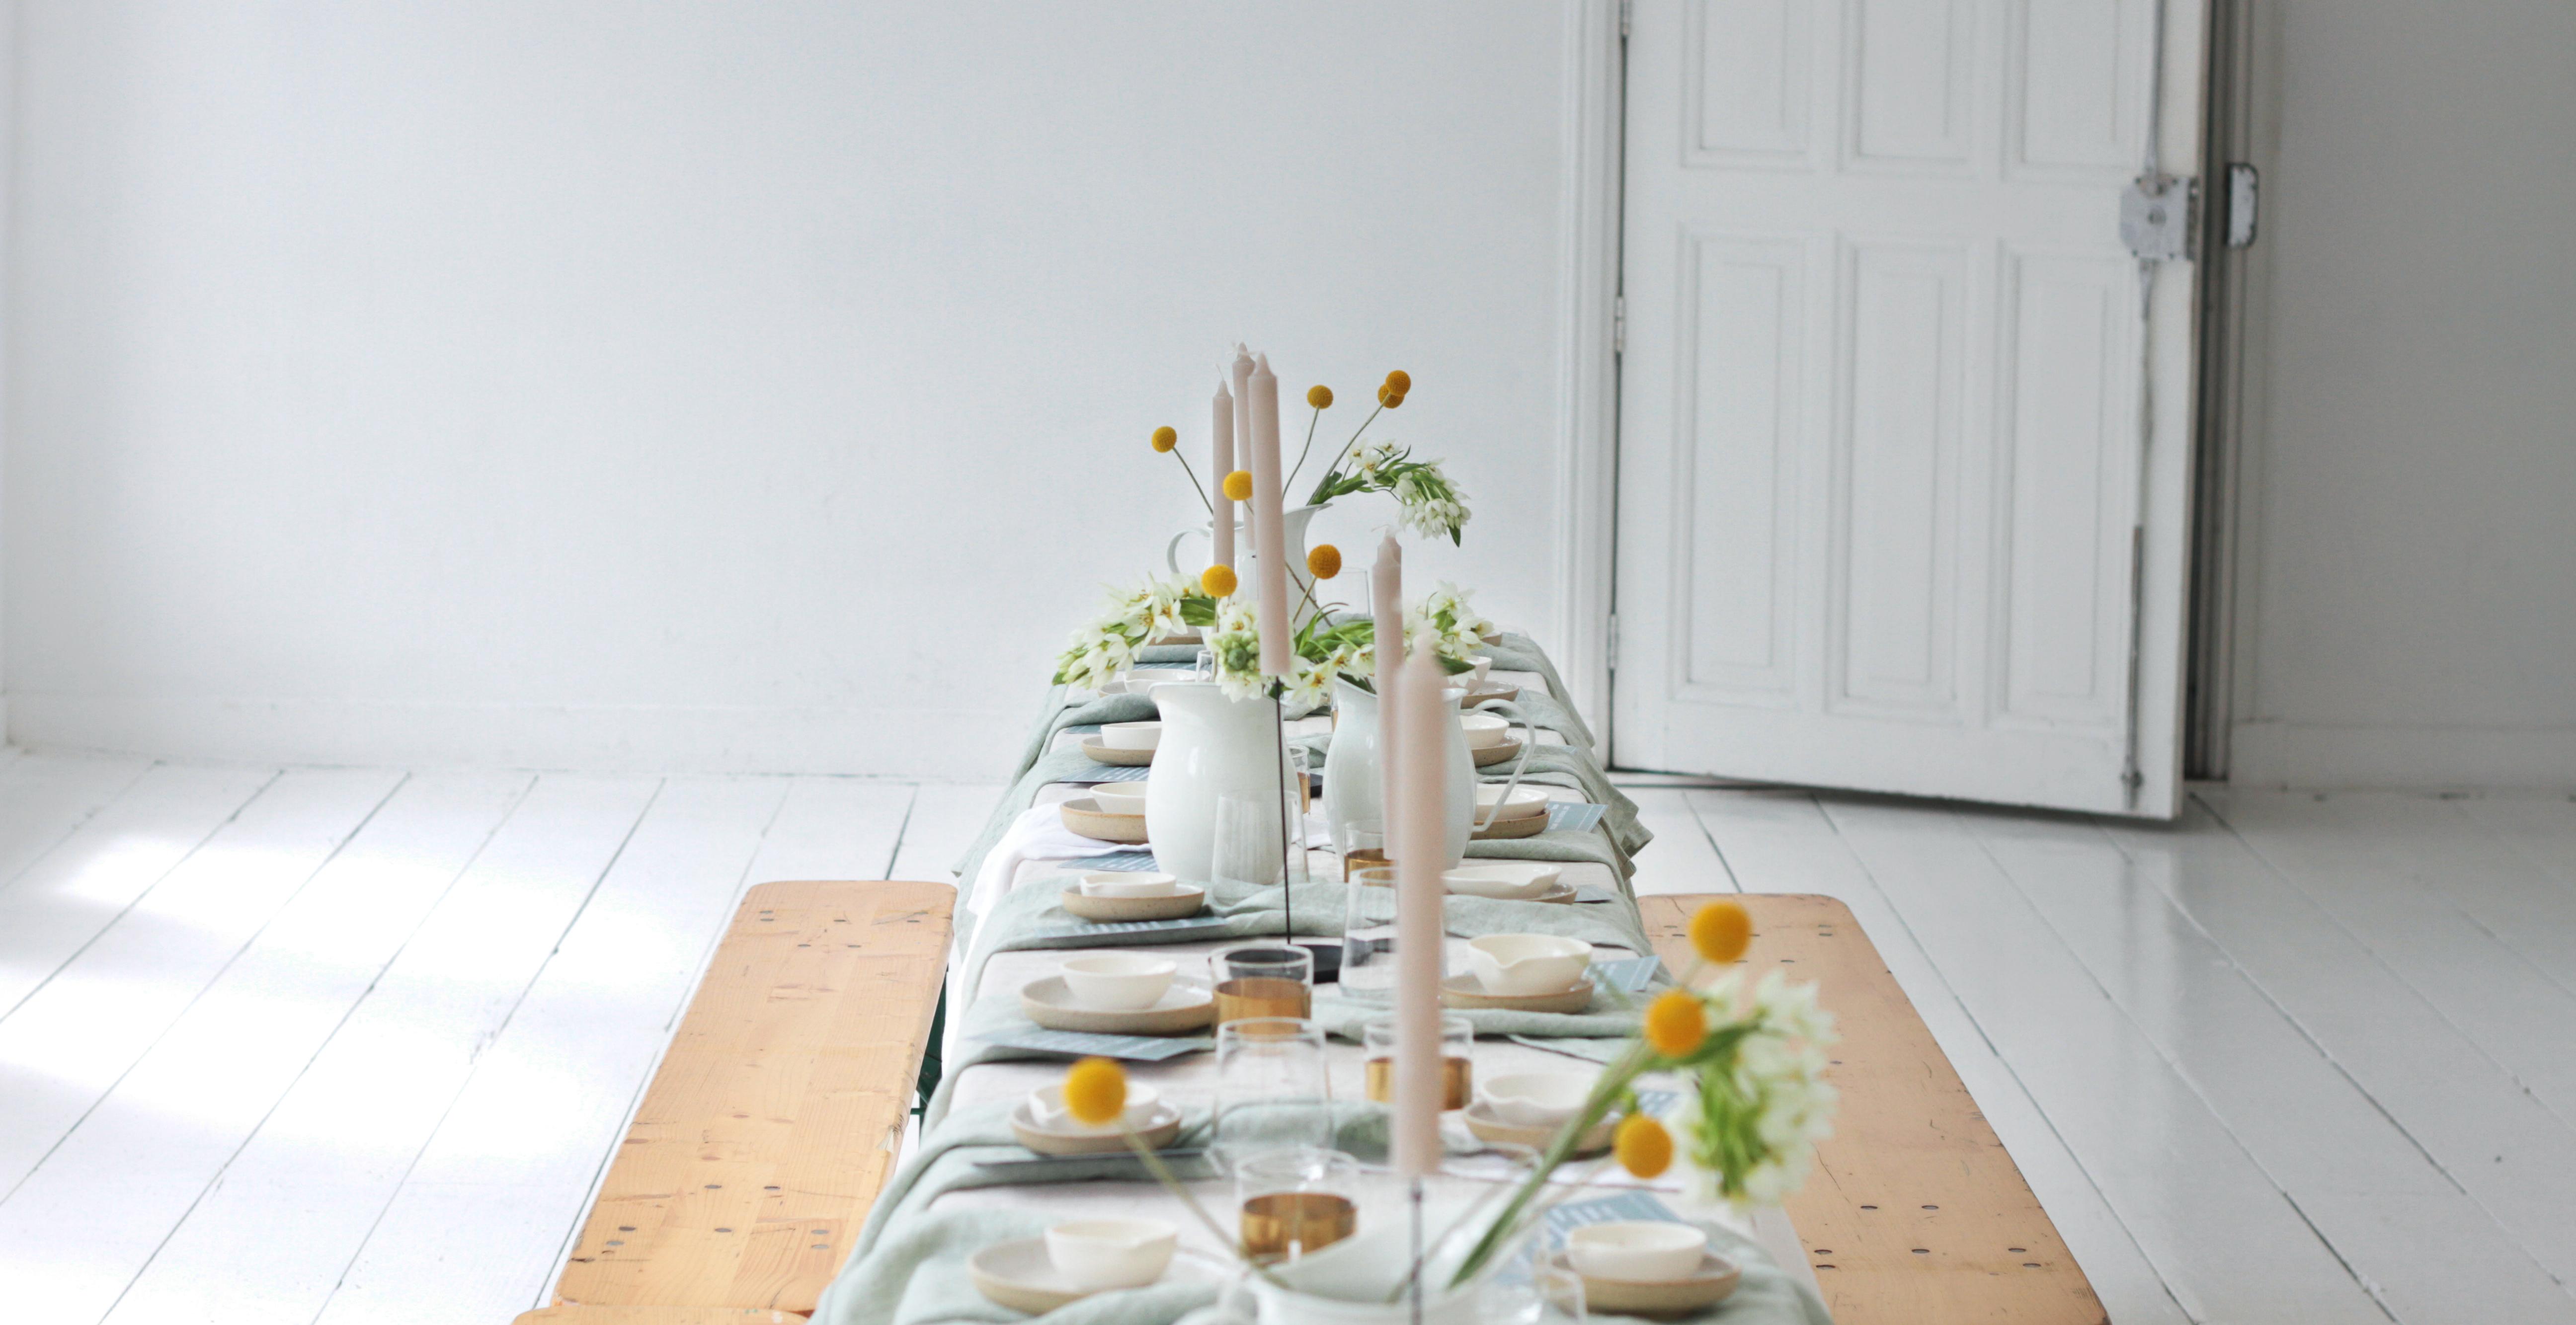 tableware flowers linen ceramics slowliving